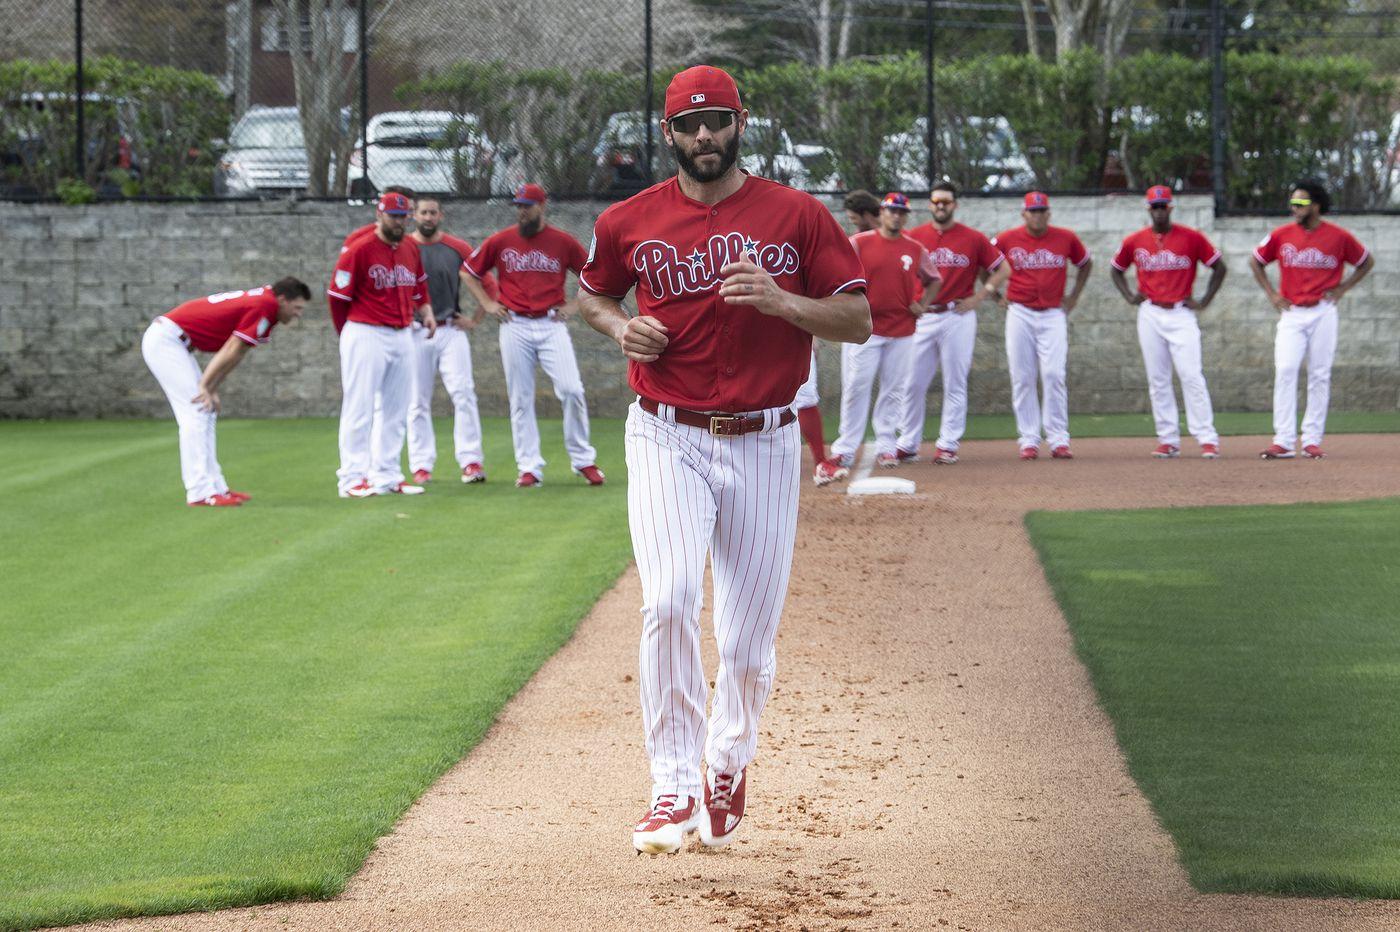 Jake Arrieta celebrated the Phillies' getting Bryce Harper by wearing a Speedo